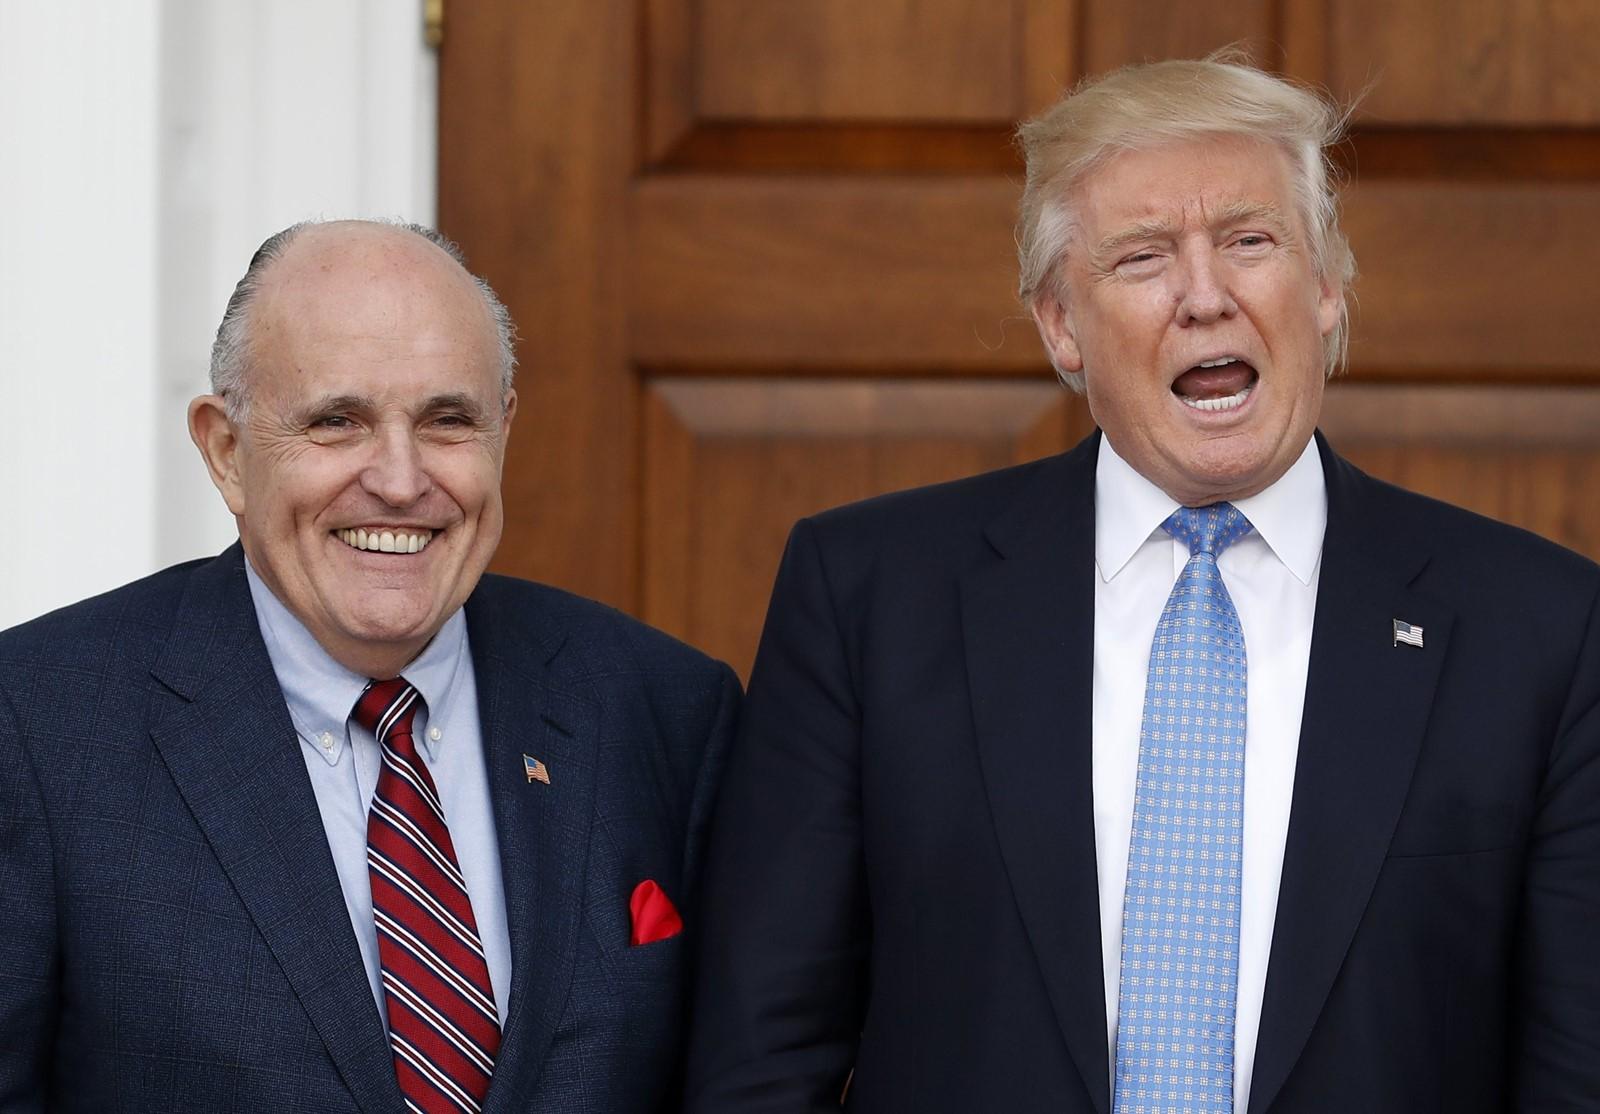 President Donald J. Trump and Rudolph W. Giuliani. — Photograph: Carolyn Kaster/Associated Press.